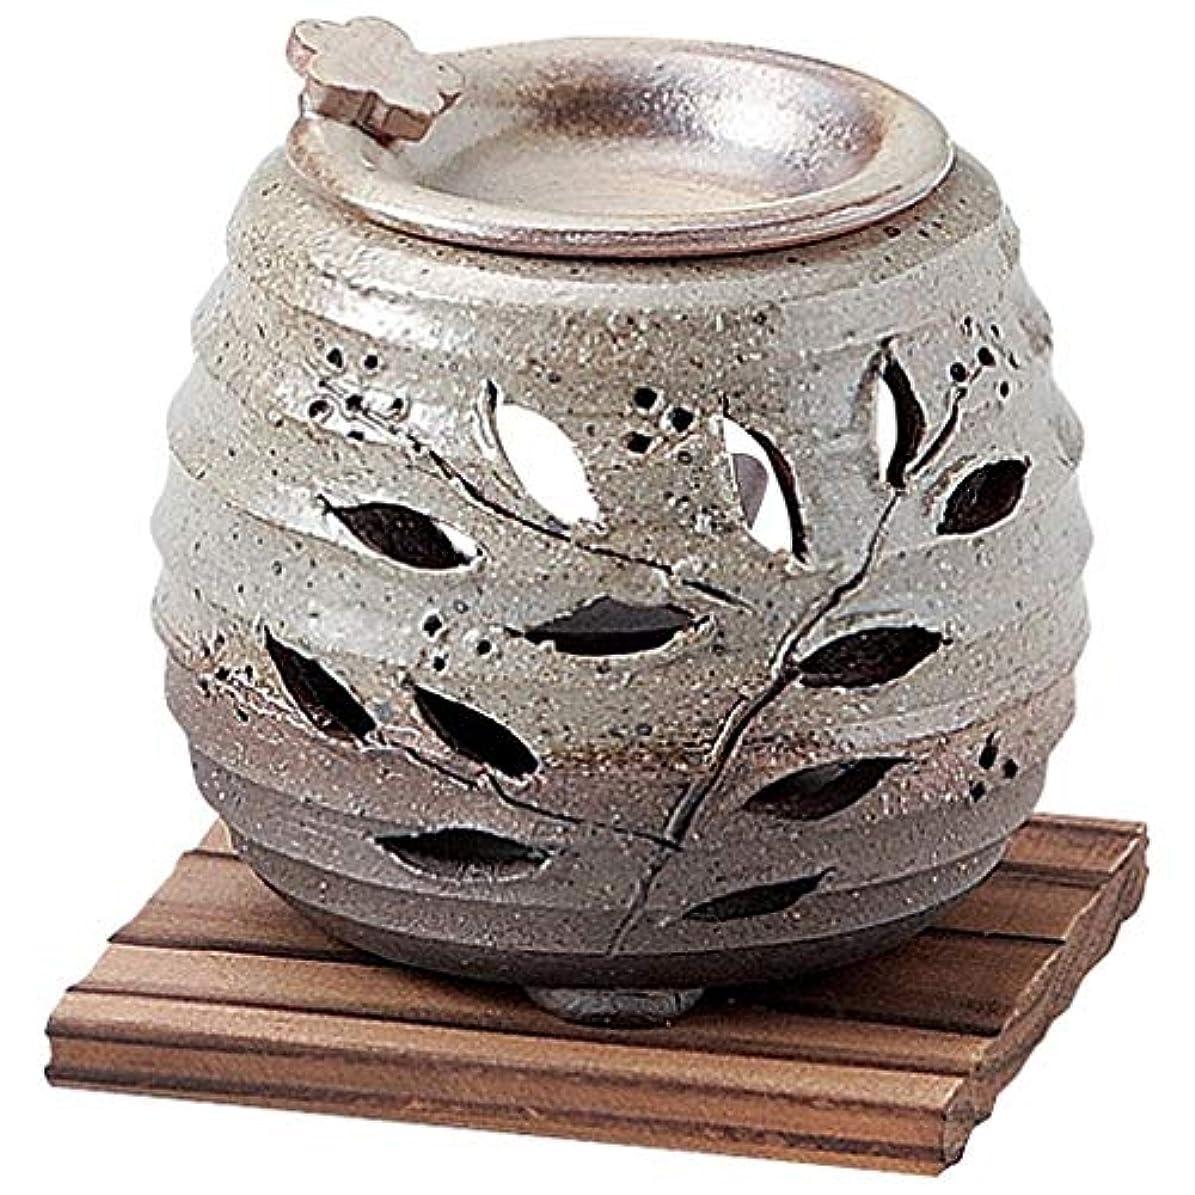 誇大妄想泥沼写真を描く常滑焼 G1718 茶香炉  径11×10.5cm